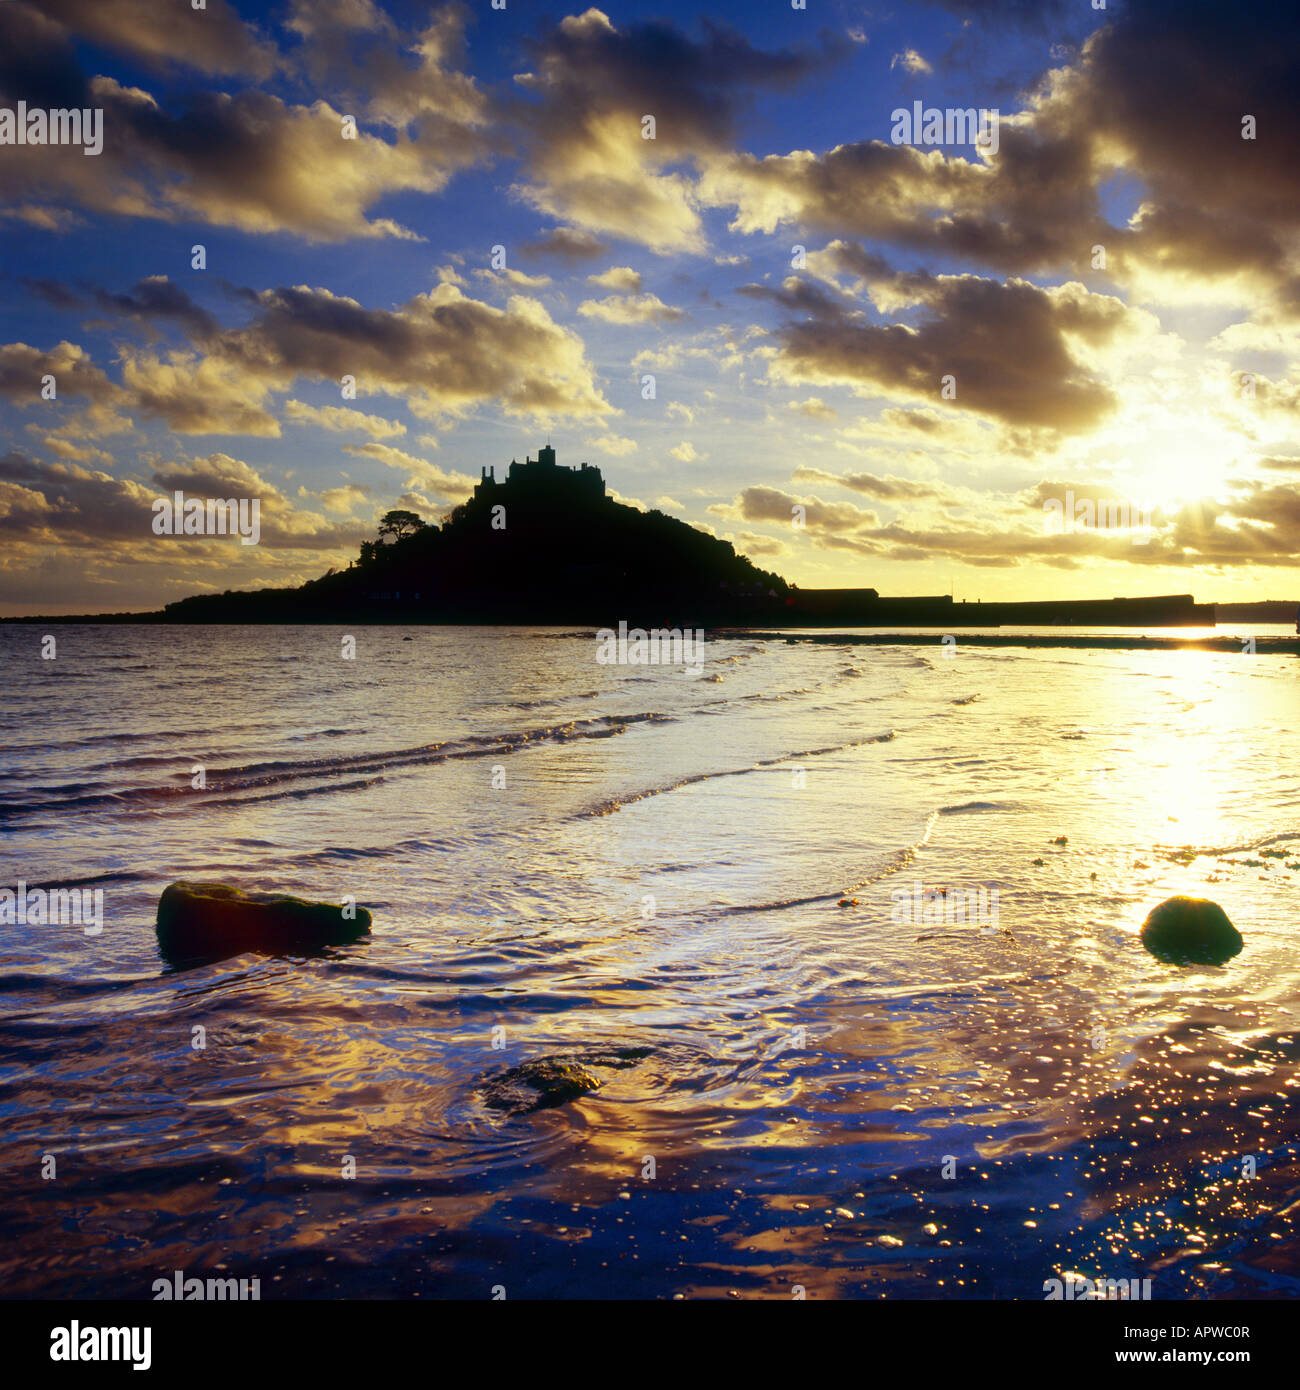 st-michaels-mount-at-sunset-mounts-bay-c